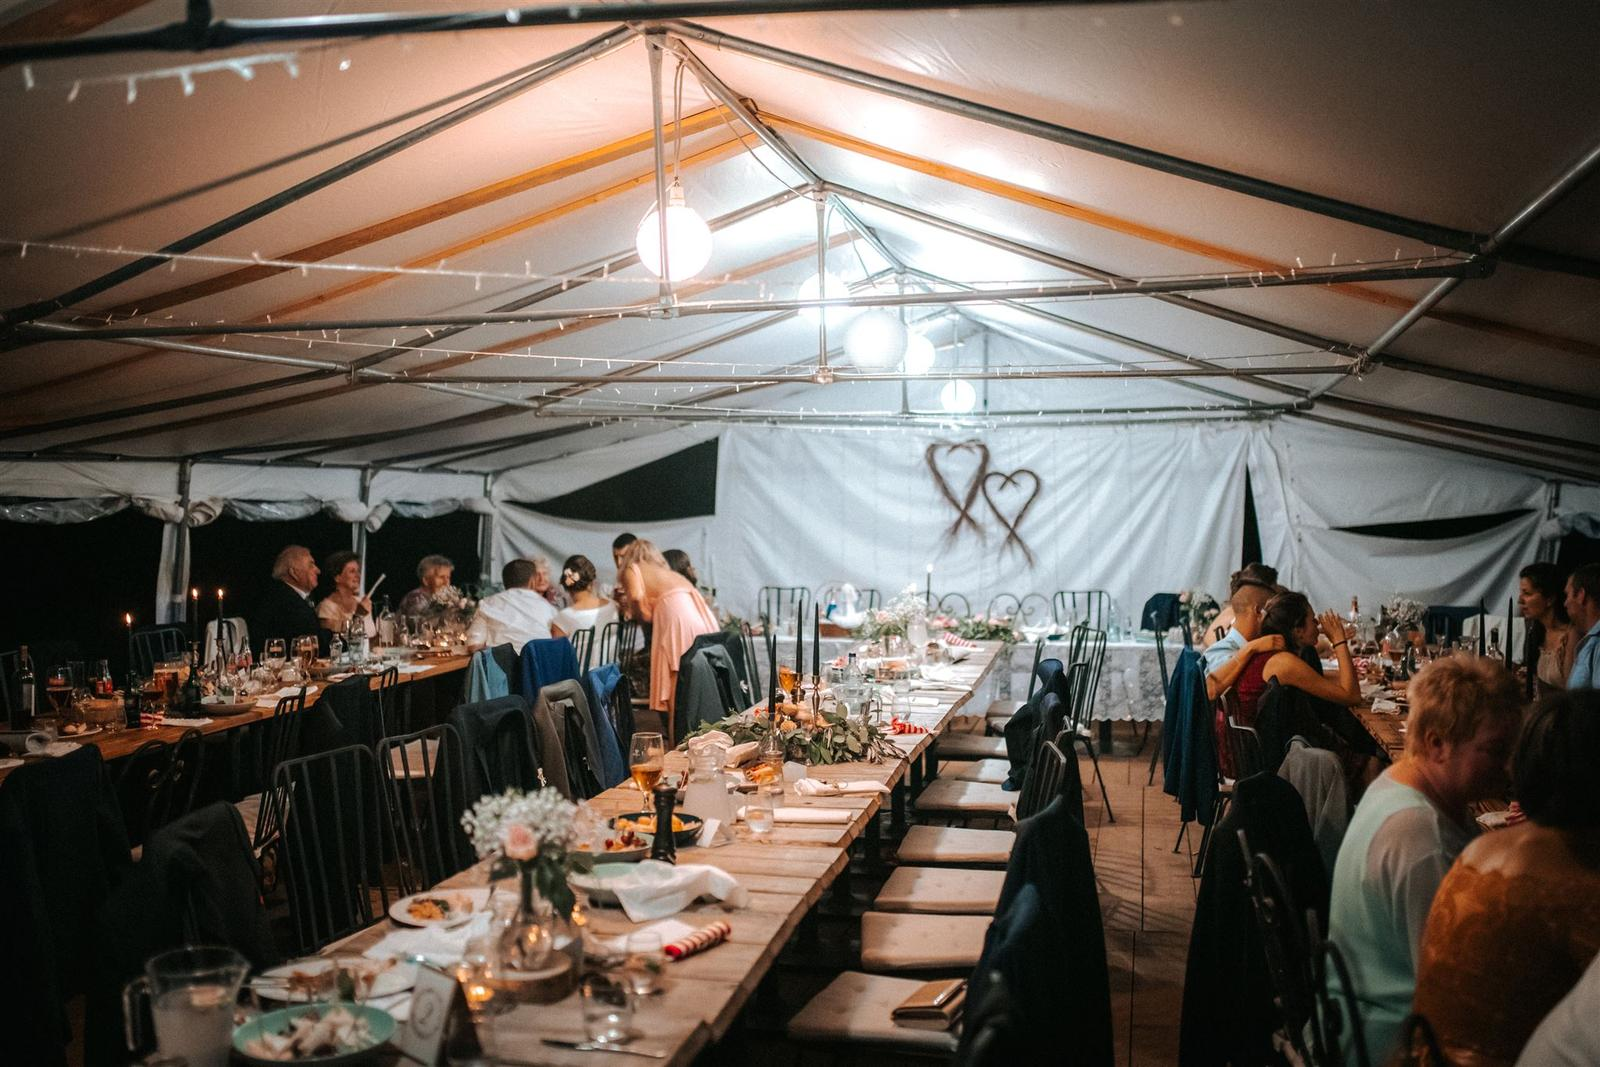 Krásna a romantická svadobná party v záhrade reštaurácie Bistra Dukát - Le Gout v srdci B. Bystrice. - Obrázok č. 19